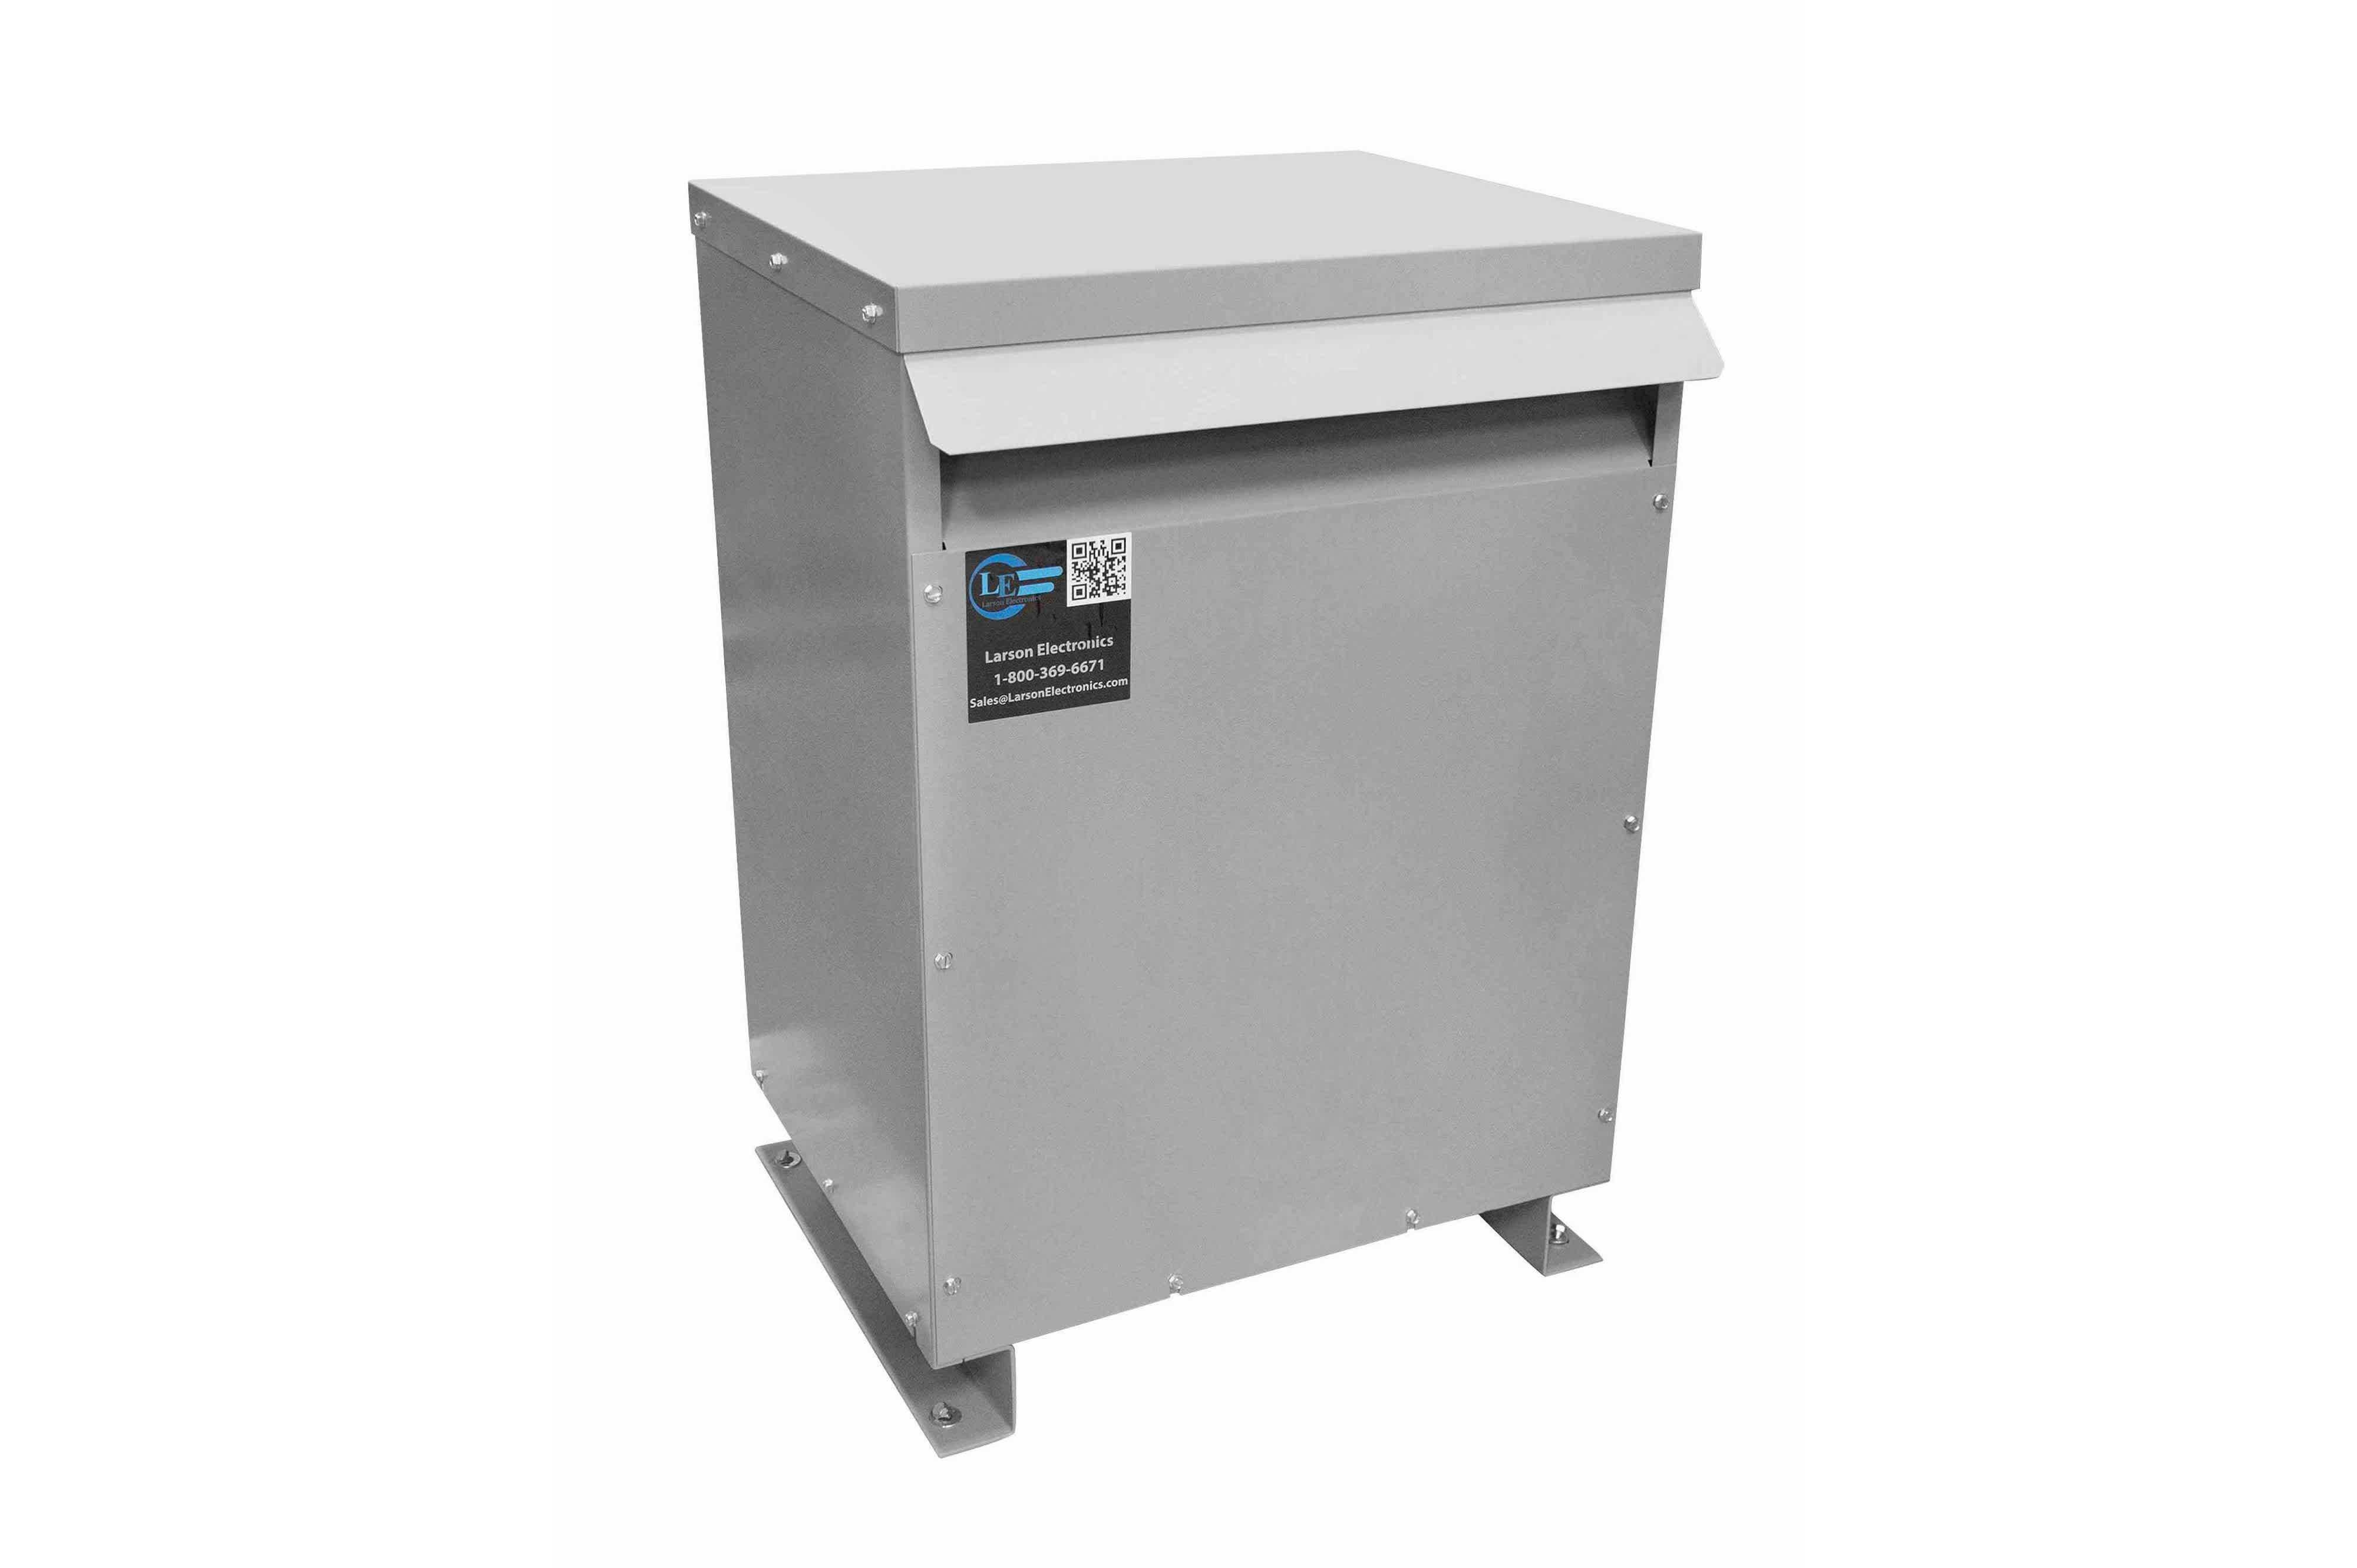 37.5 kVA 3PH DOE Transformer, 440V Delta Primary, 208Y/120 Wye-N Secondary, N3R, Ventilated, 60 Hz